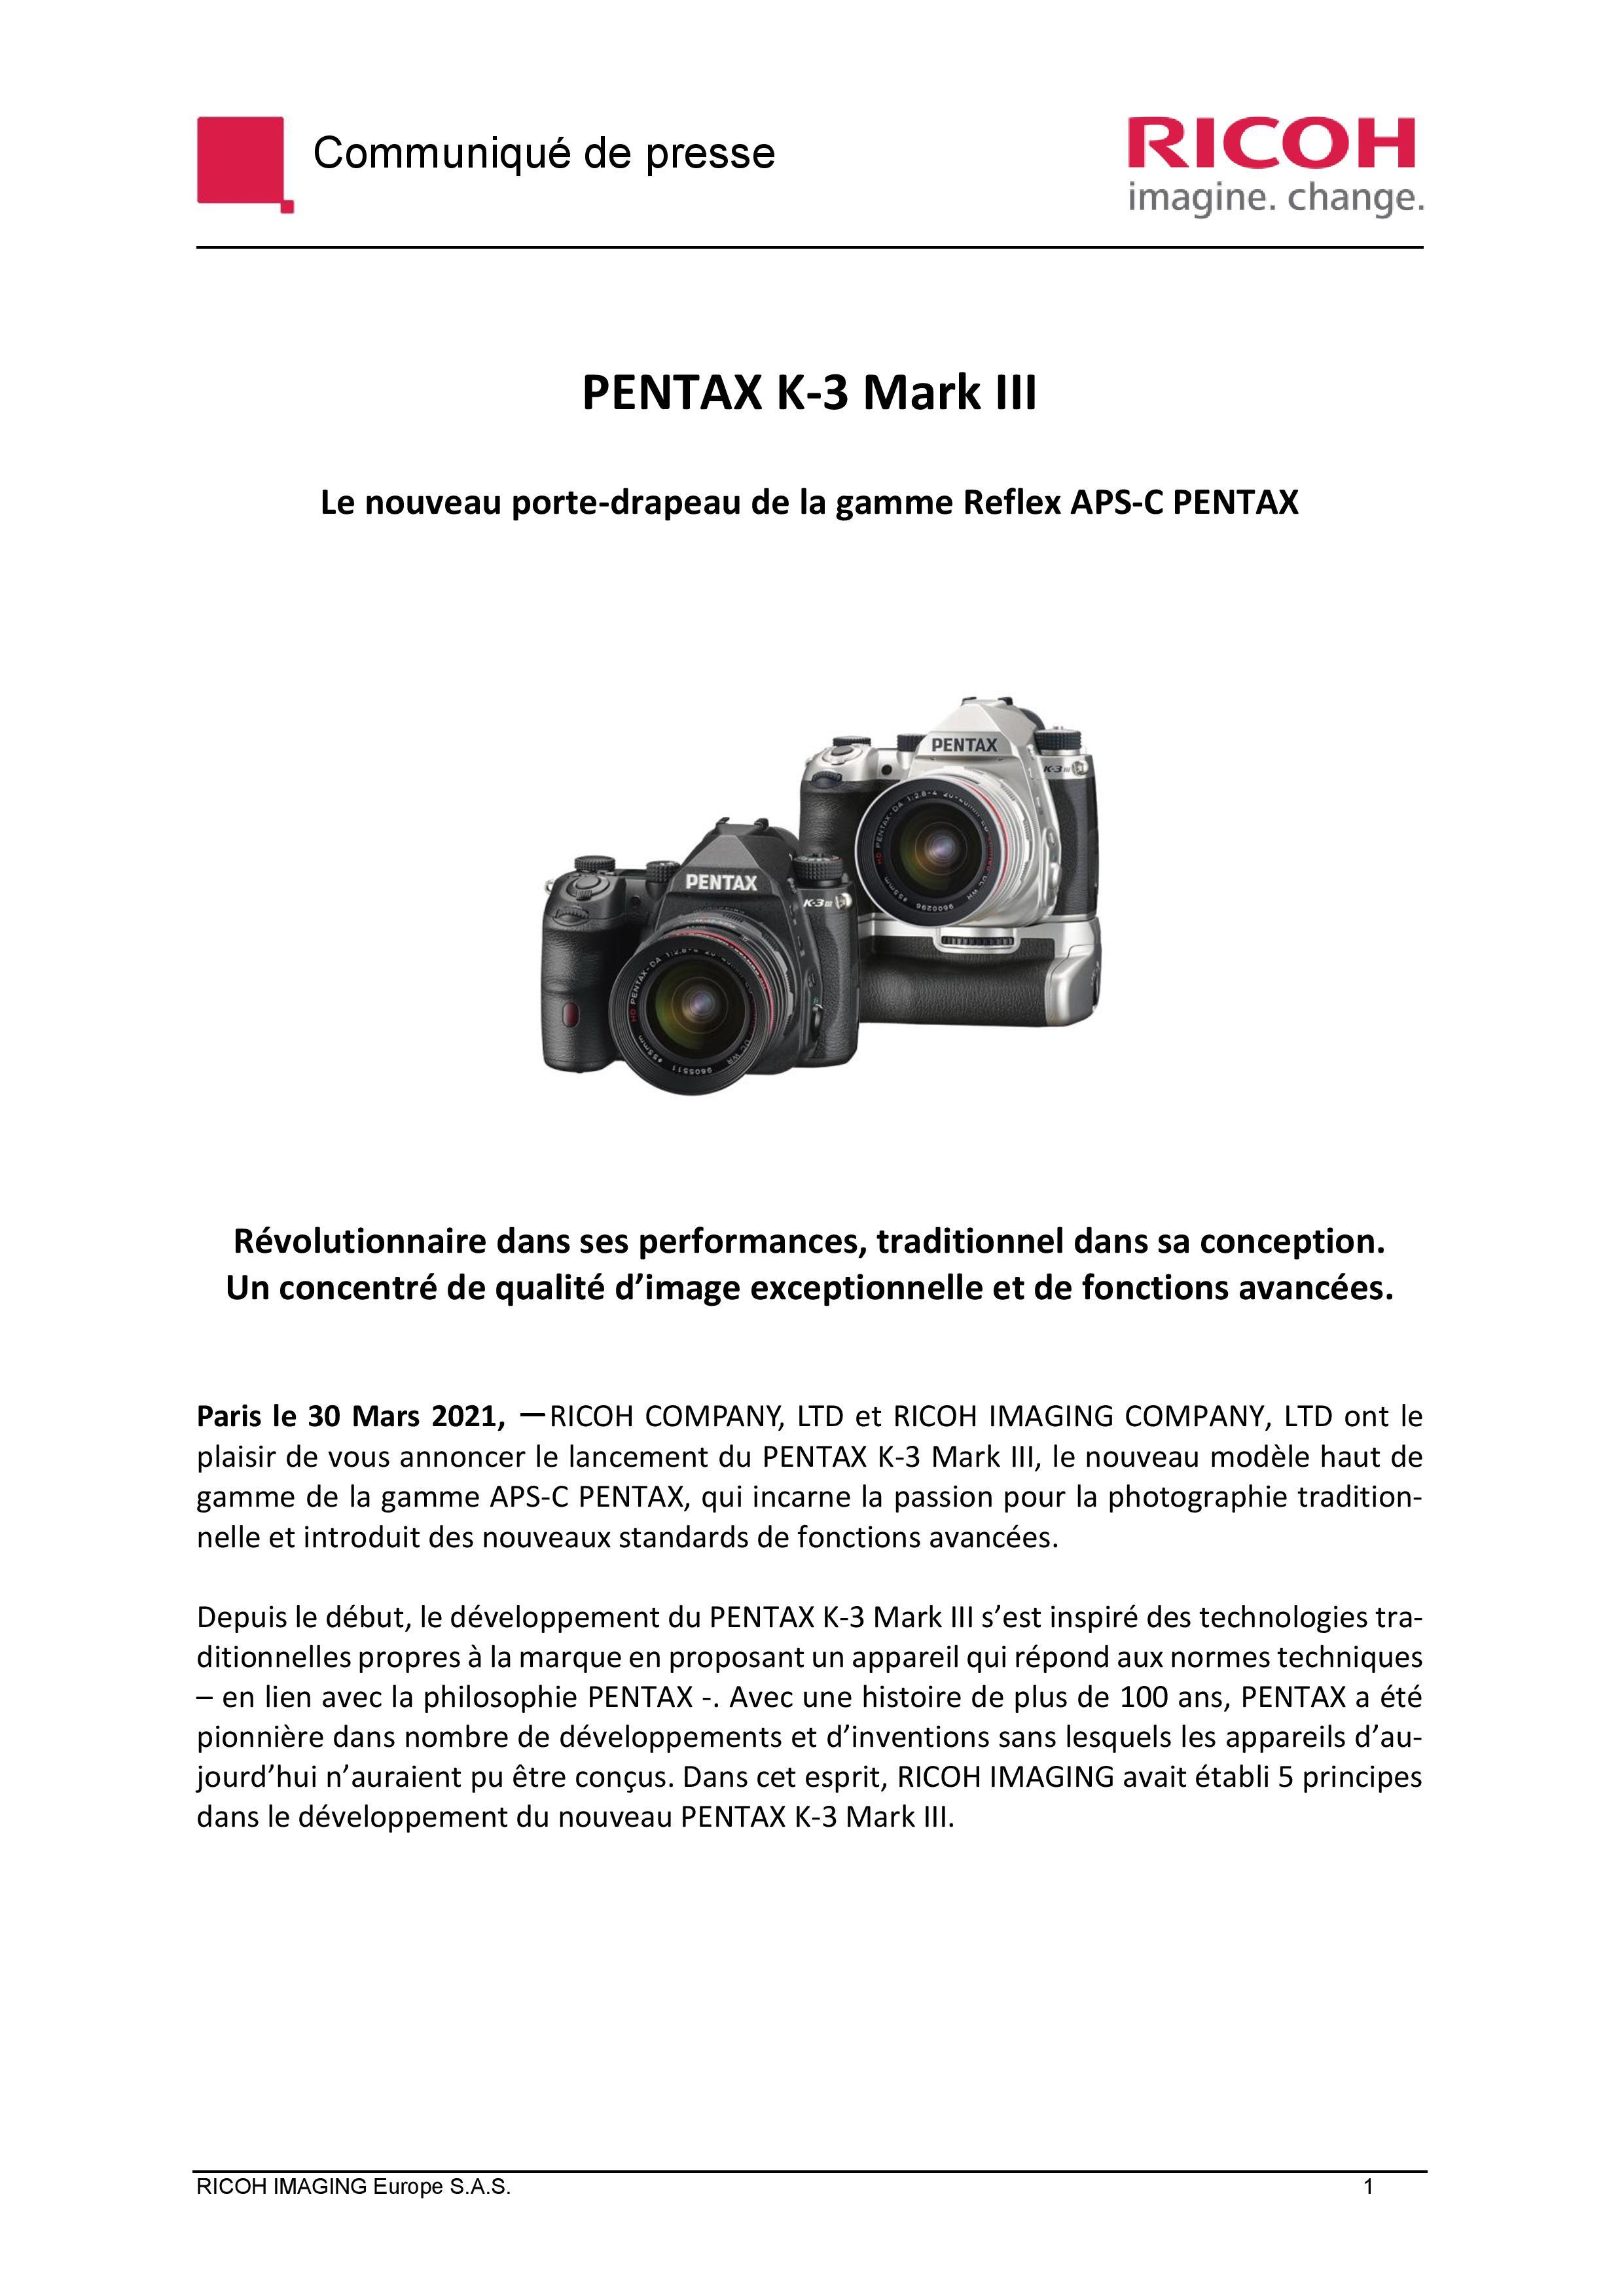 PENTAX RICOH IMAGING - Communiqué de presse du K3 Mark III 21033103121923142217344182